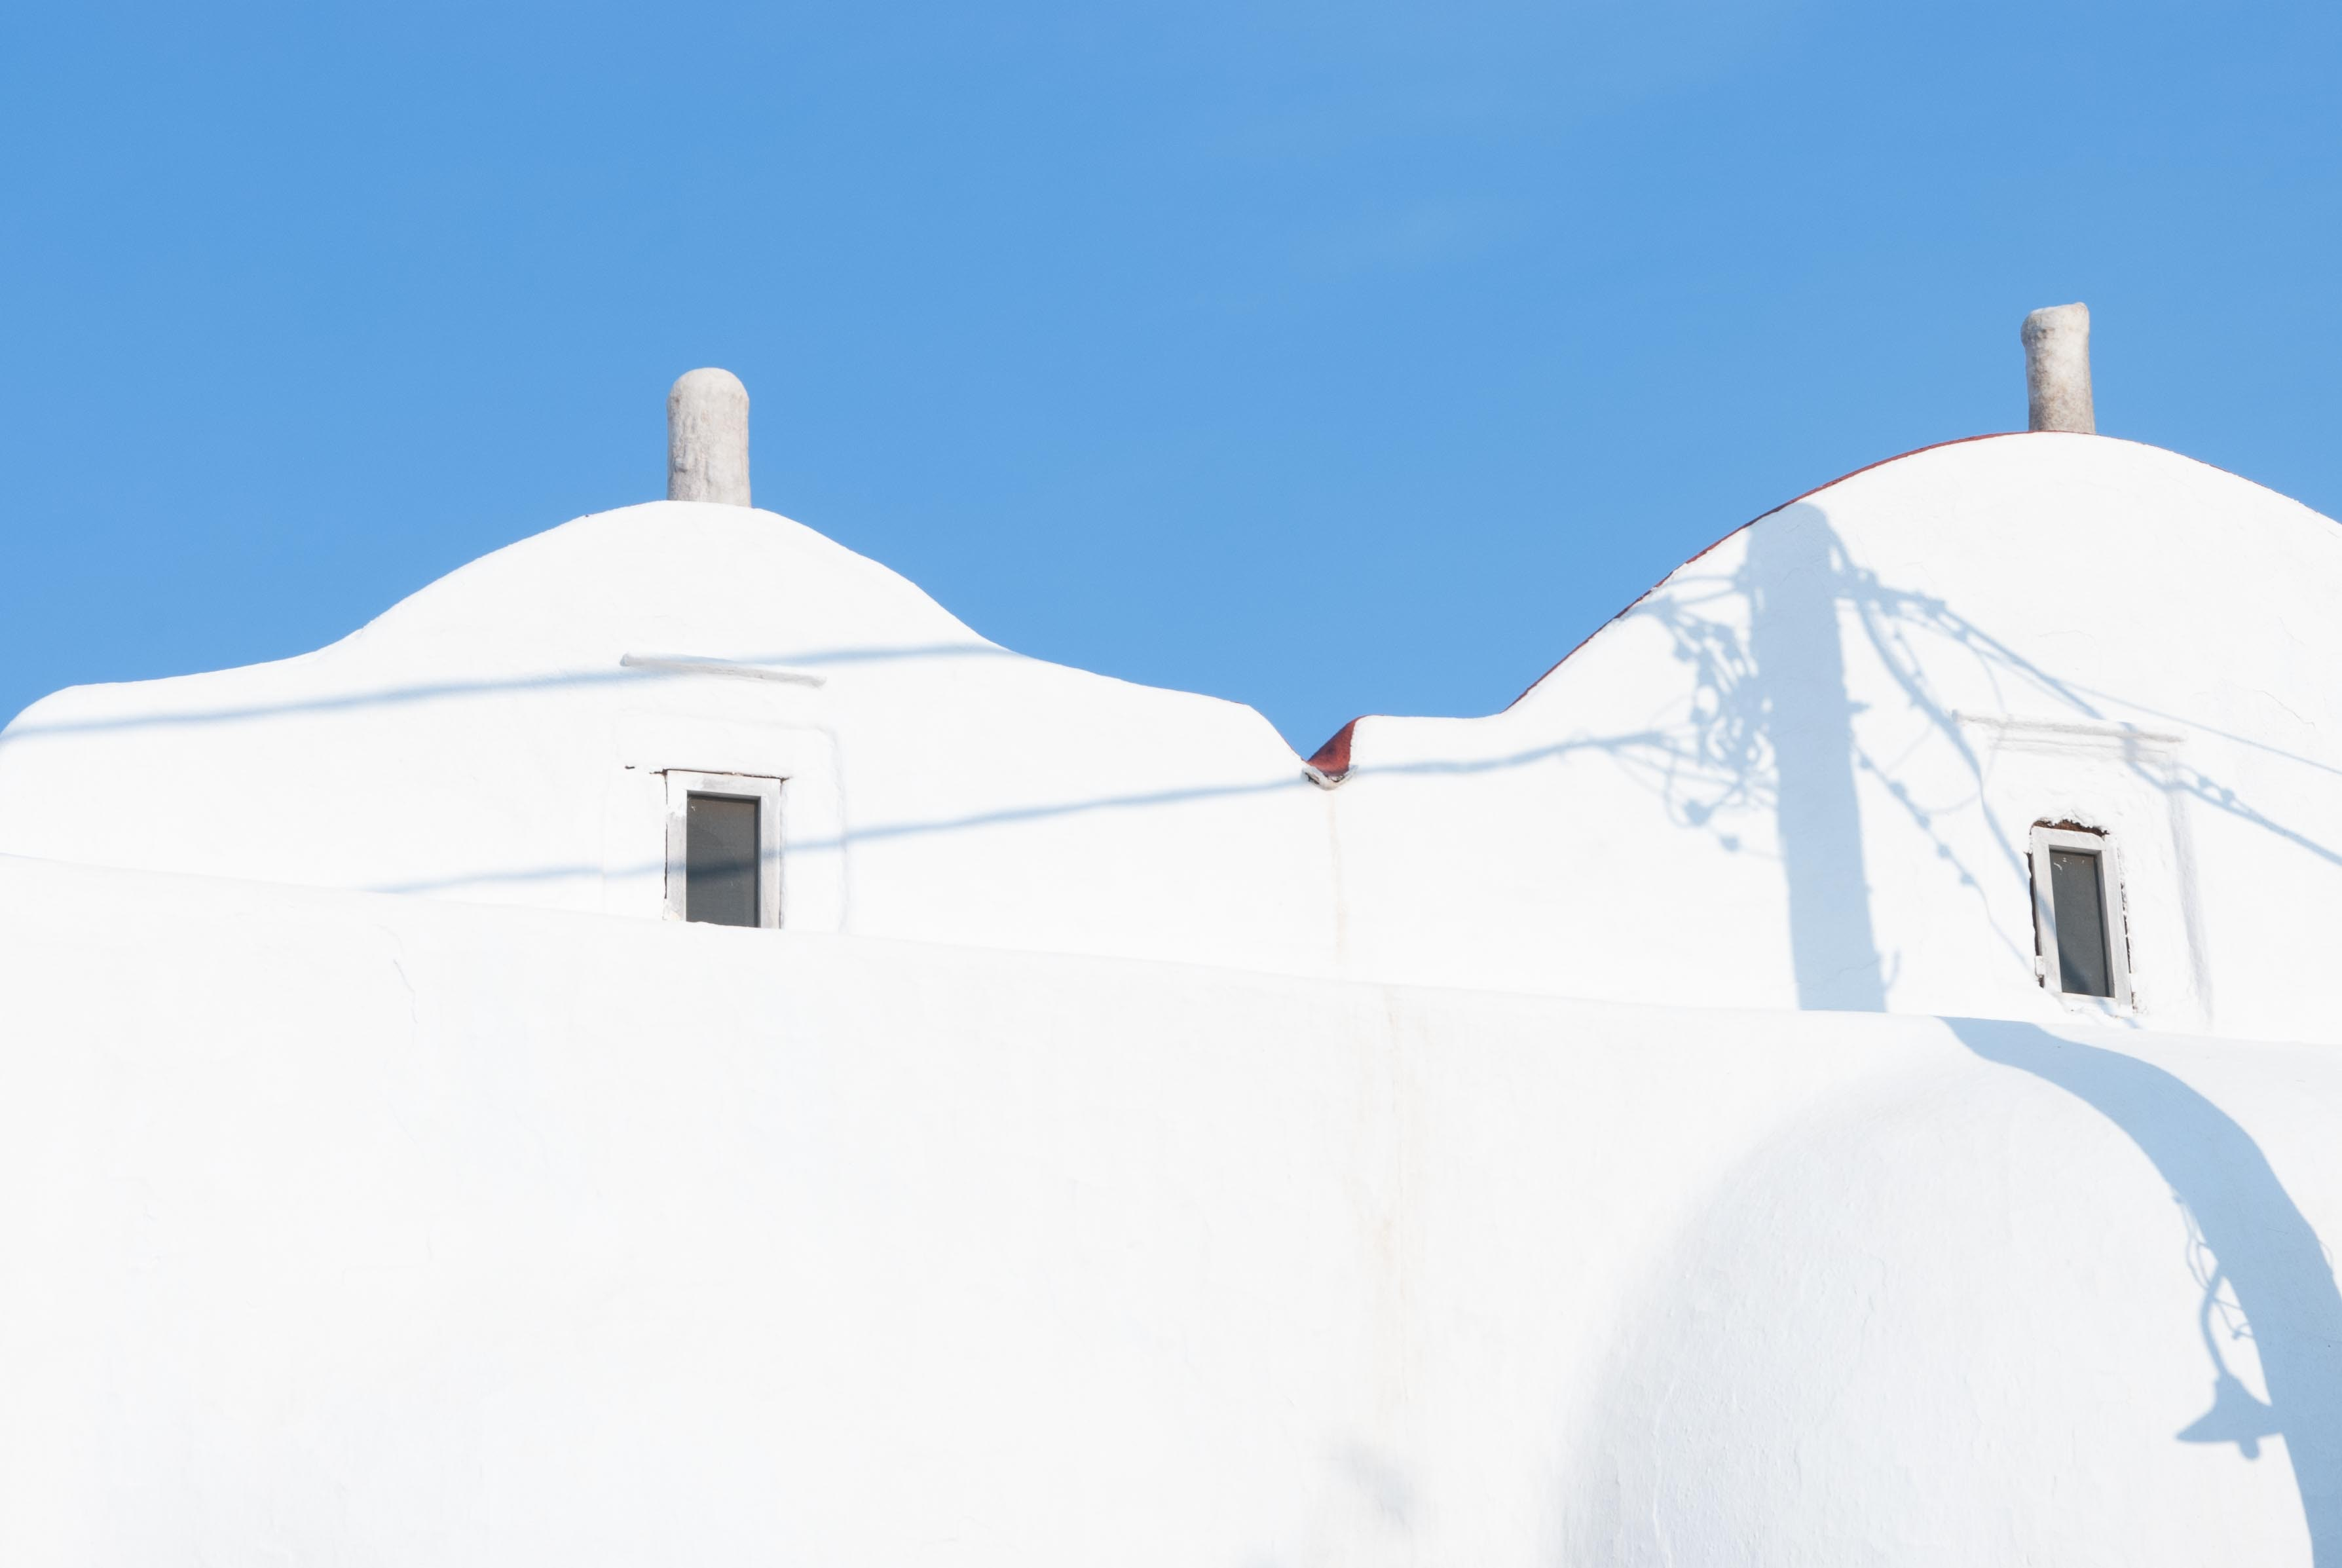 photo of a white concrete building